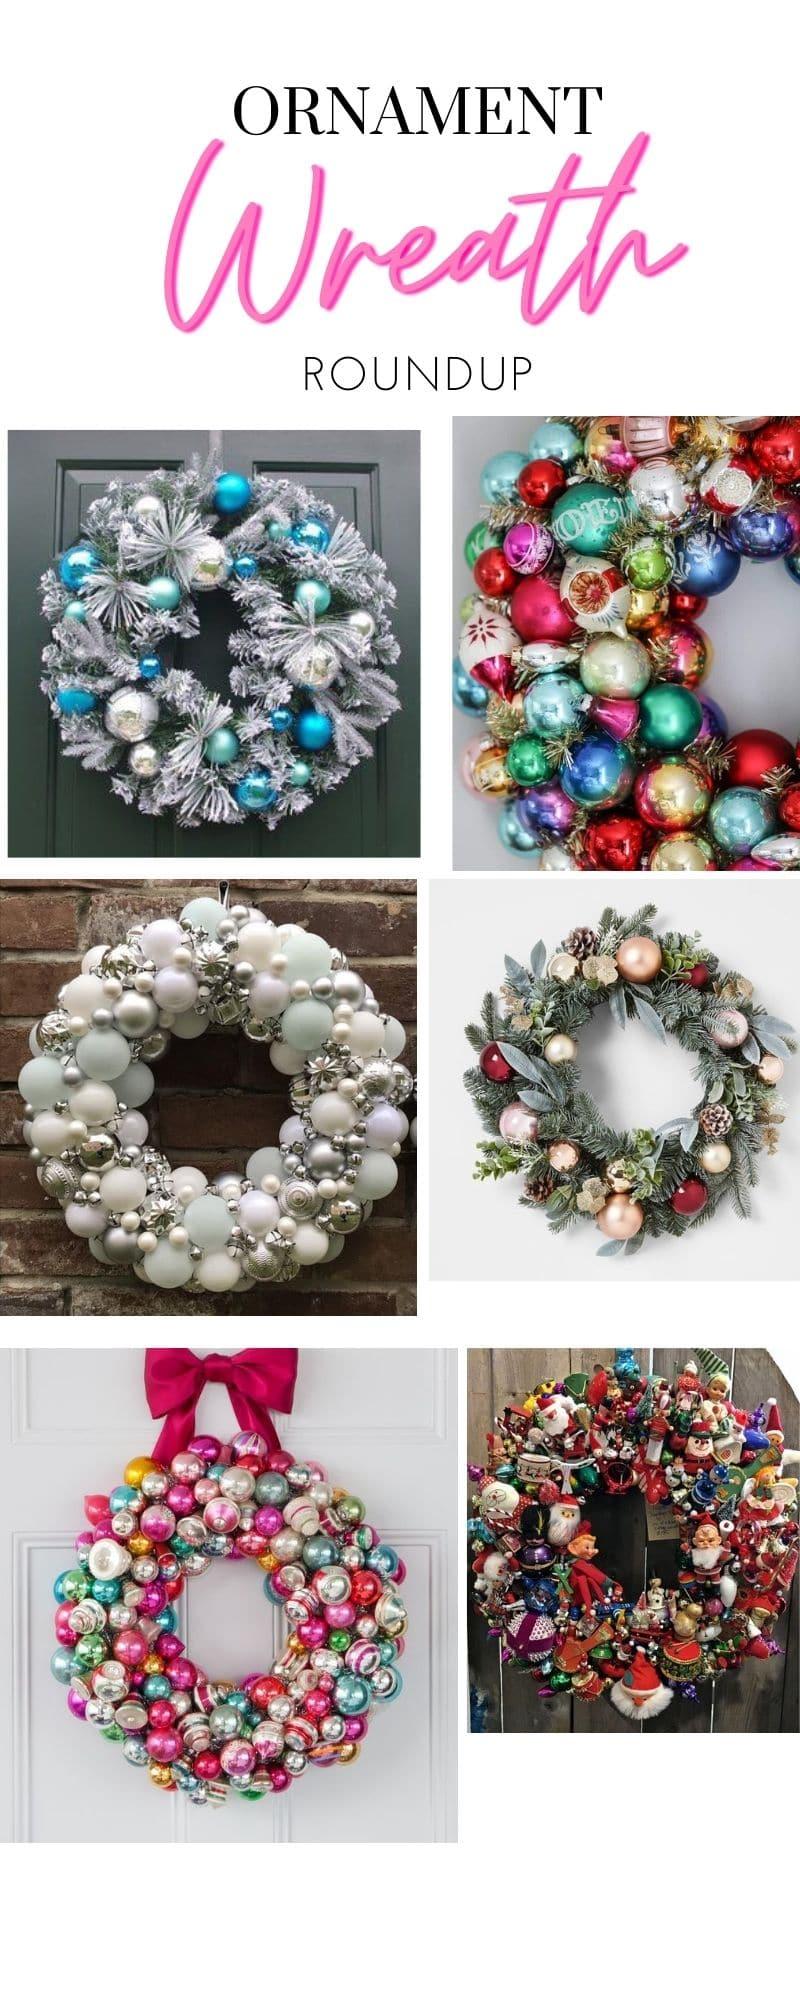 DIY Ornament Wreath RoundUp